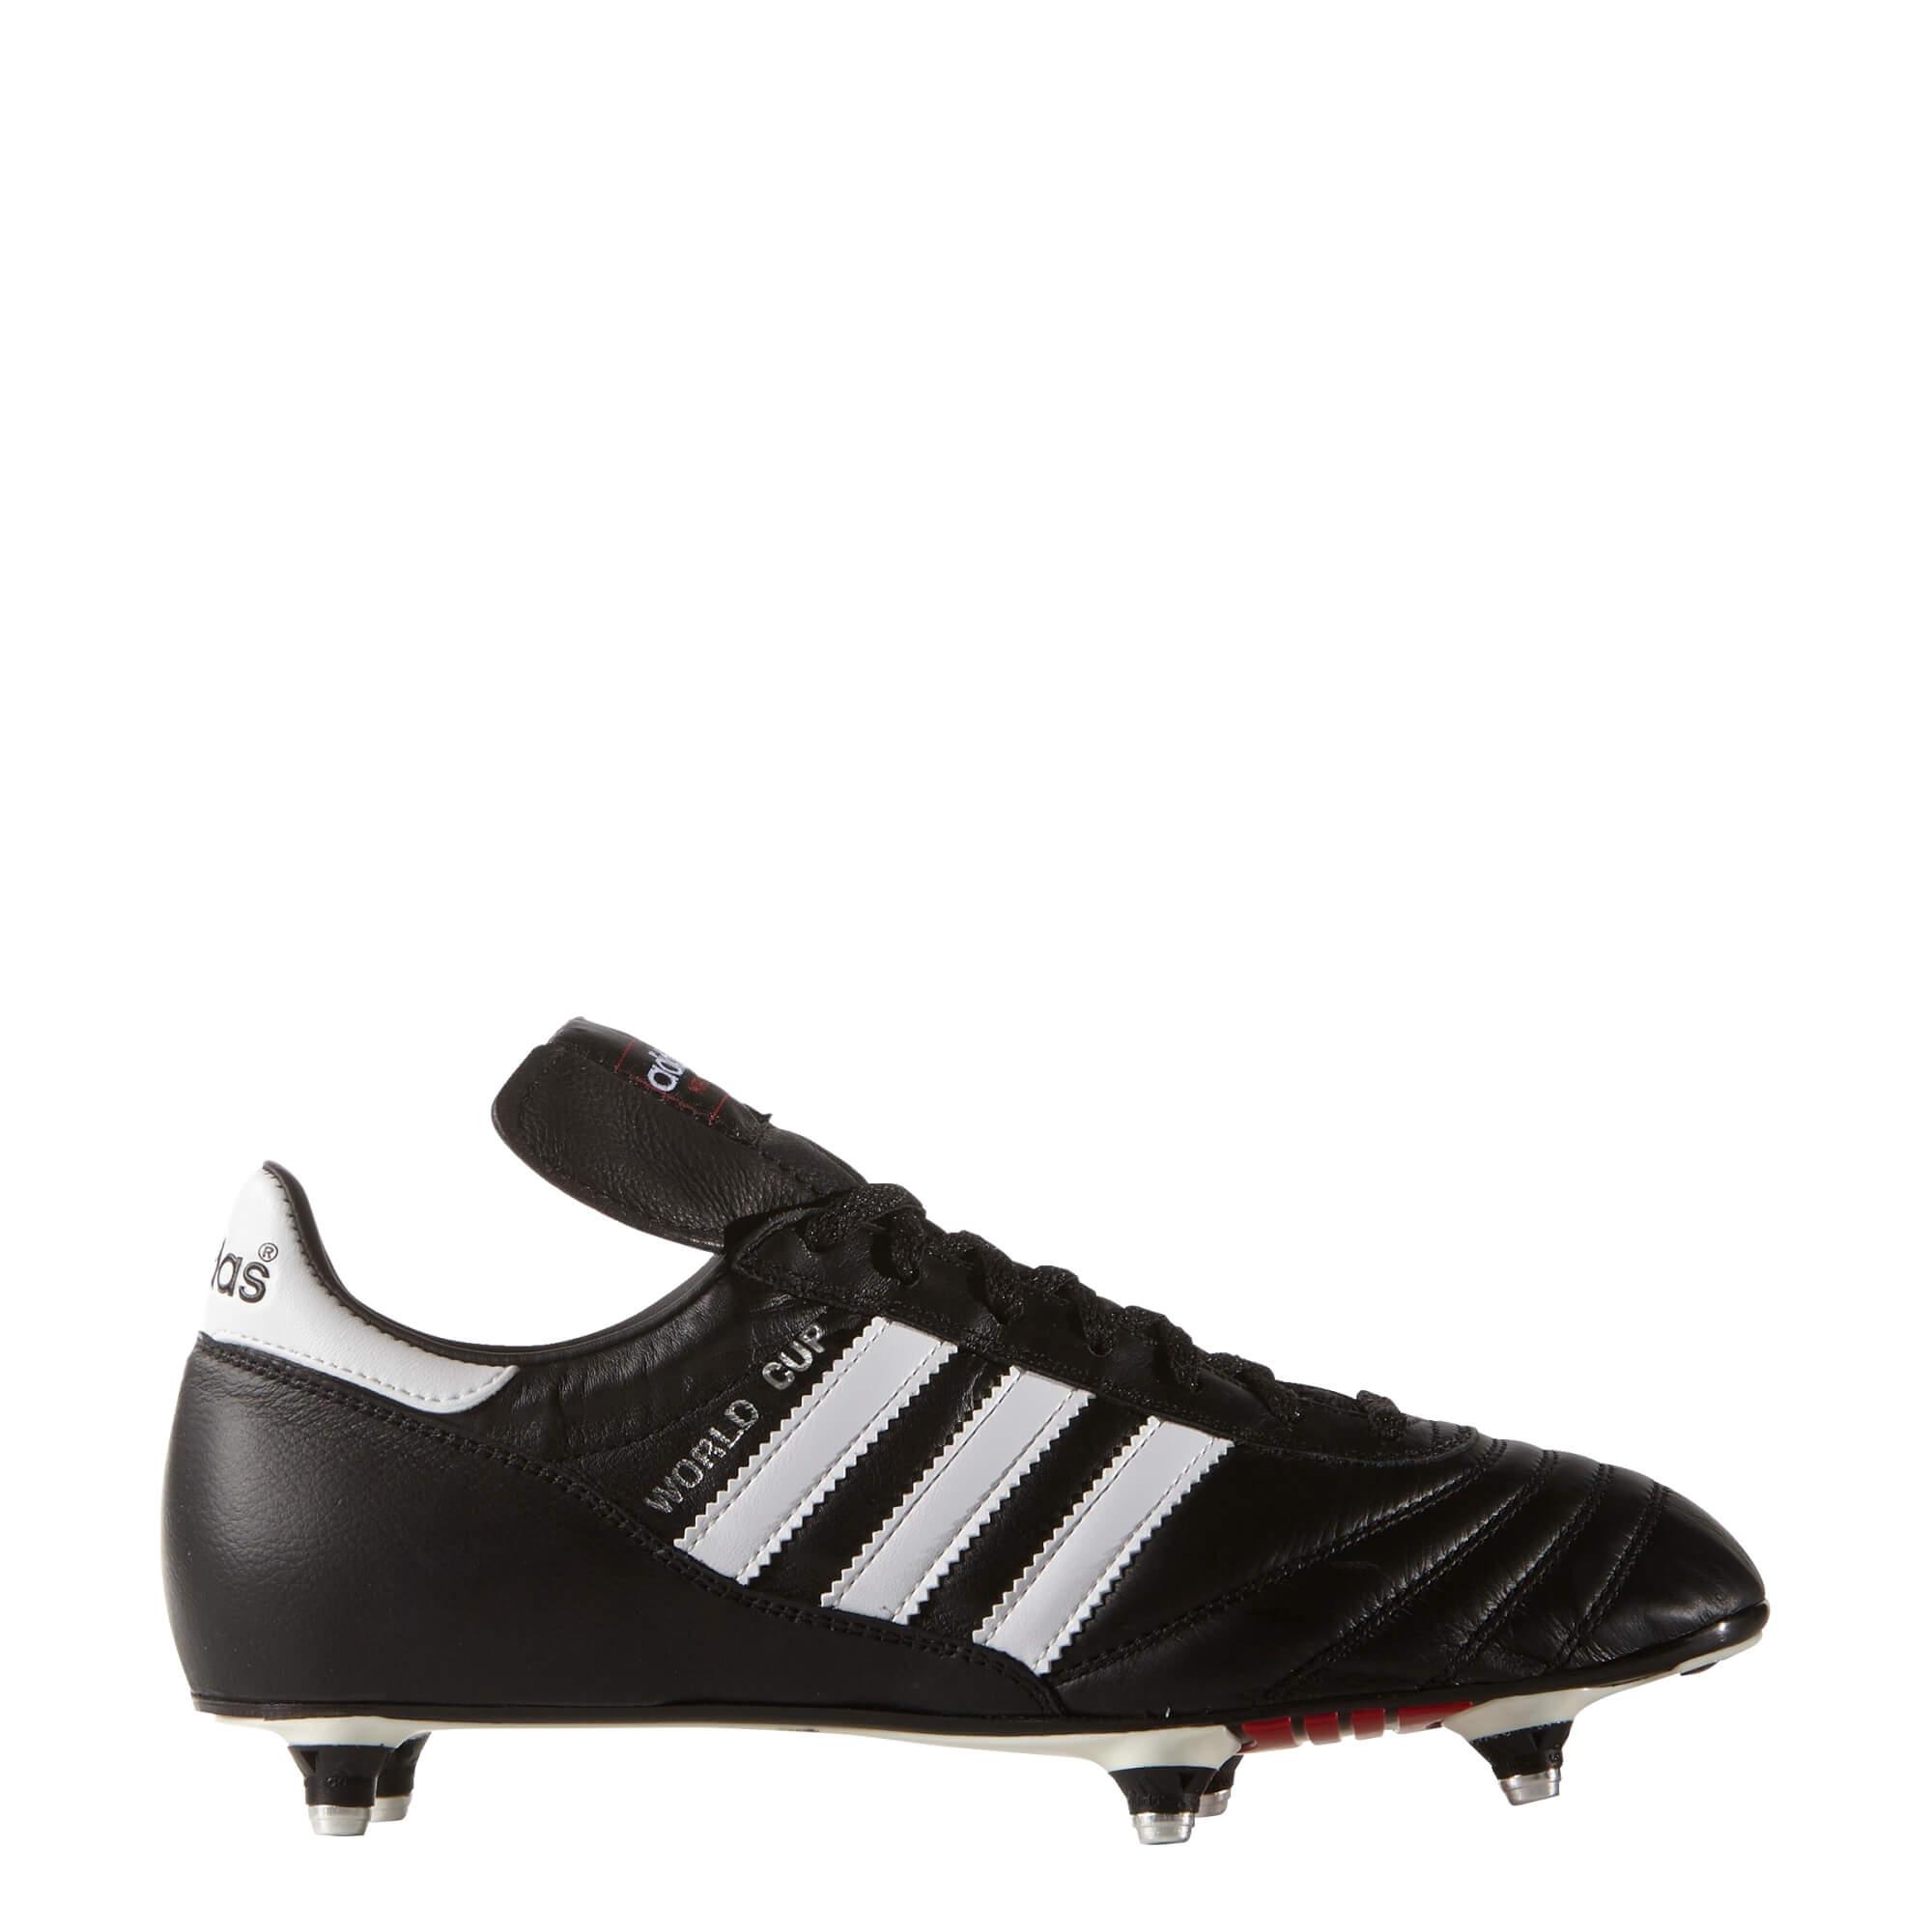 voetbalschoenen adidas world cup